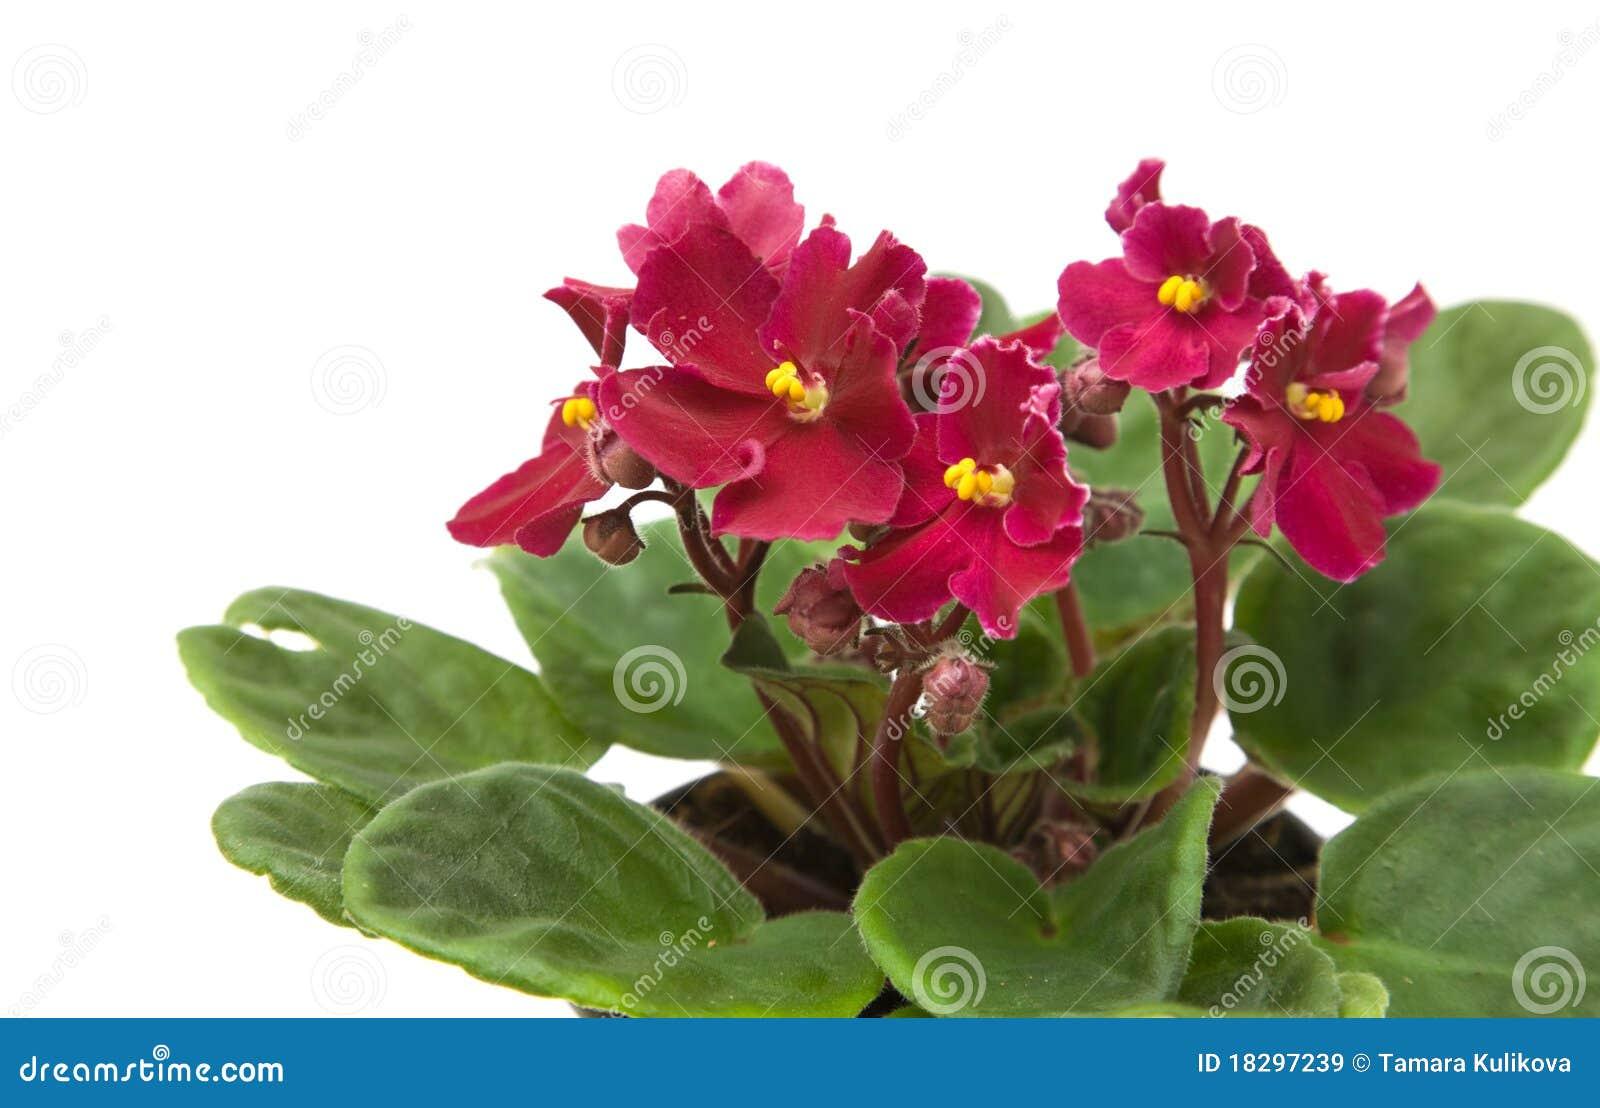 Violette africaine images libres de droits image 18297239 for Violette africane